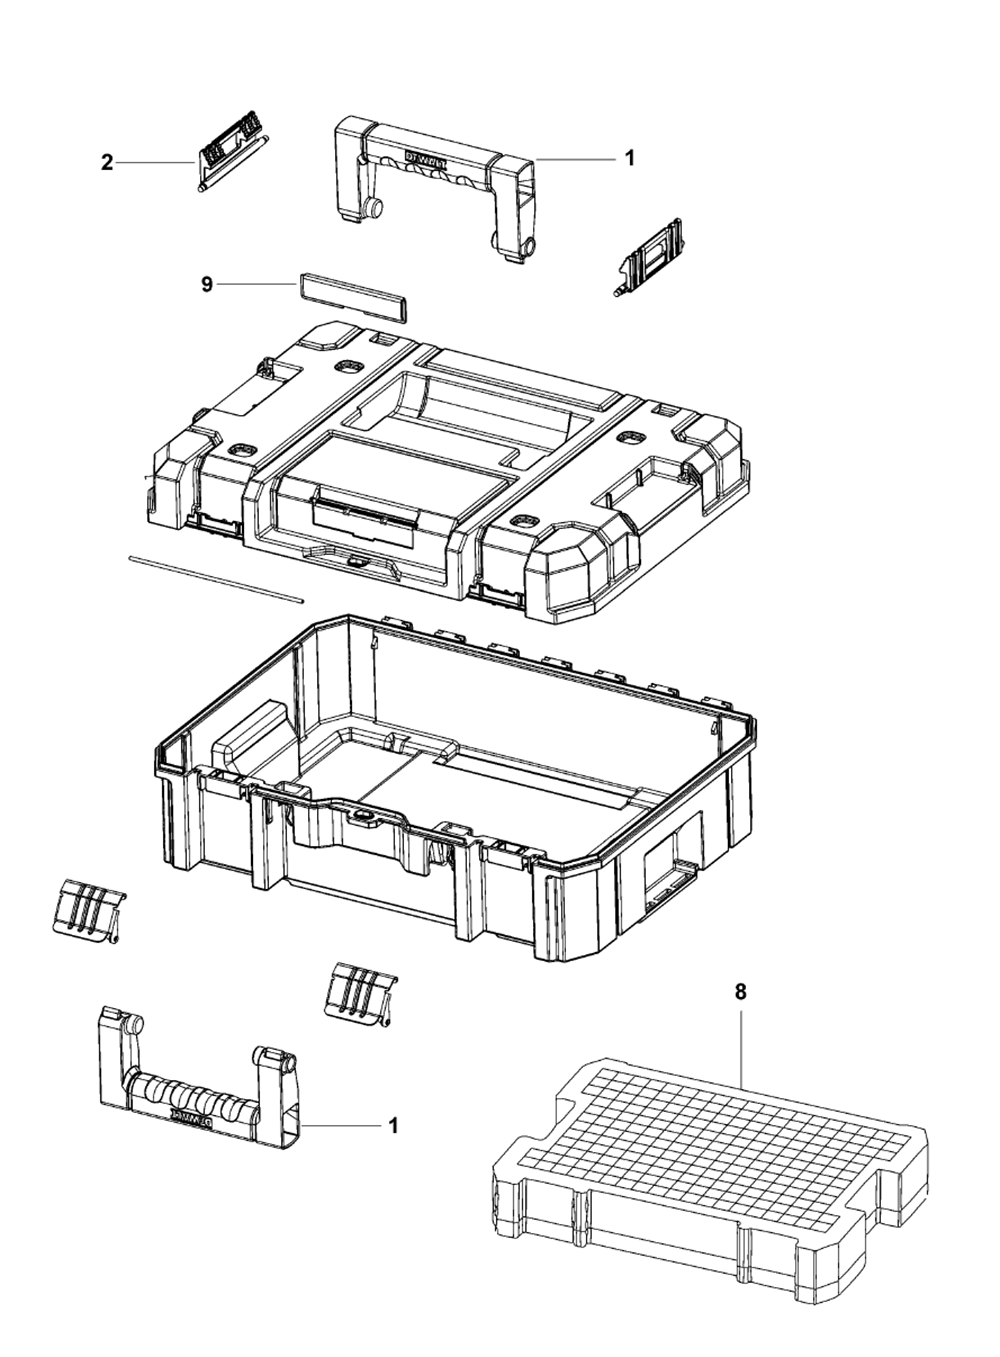 Buy Dewalt Dwst17807 Type 0 Tstak Case Flat Top Replacement Wilton 846 Parts List And Diagram Ereplacementpartscom Schematic